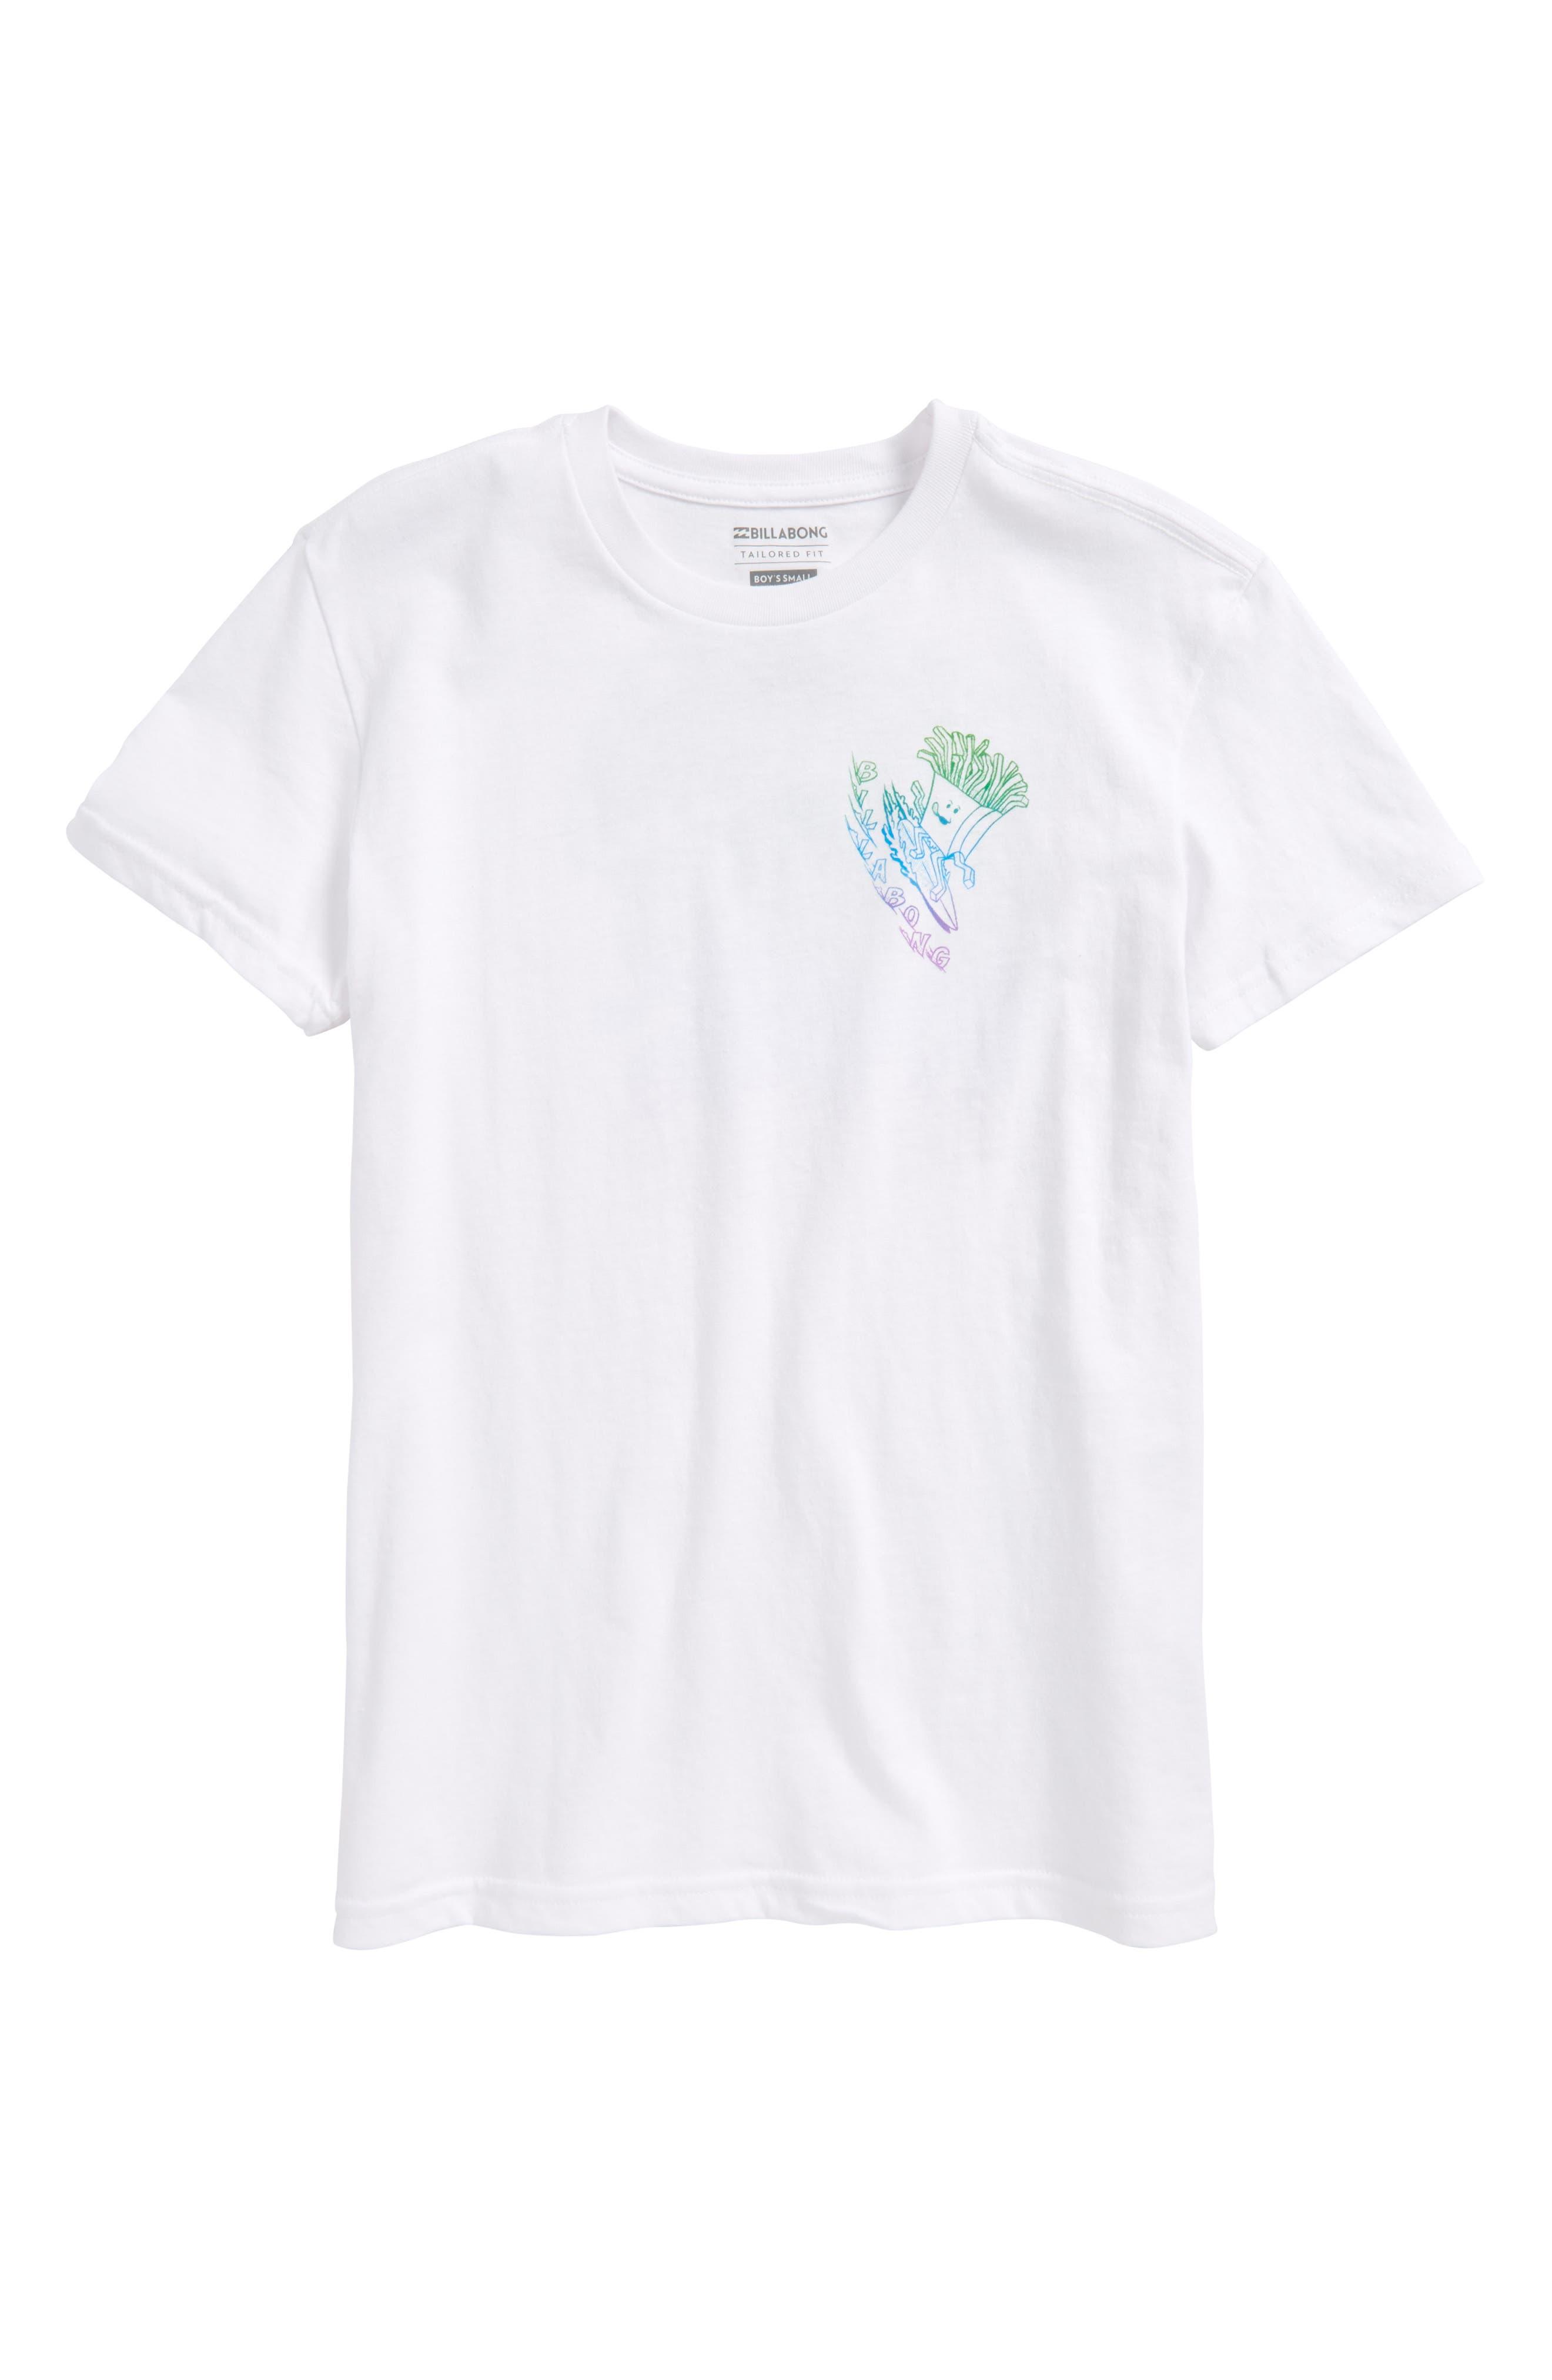 Snacks & Shacks Graphic T-Shirt,                             Main thumbnail 1, color,                             100